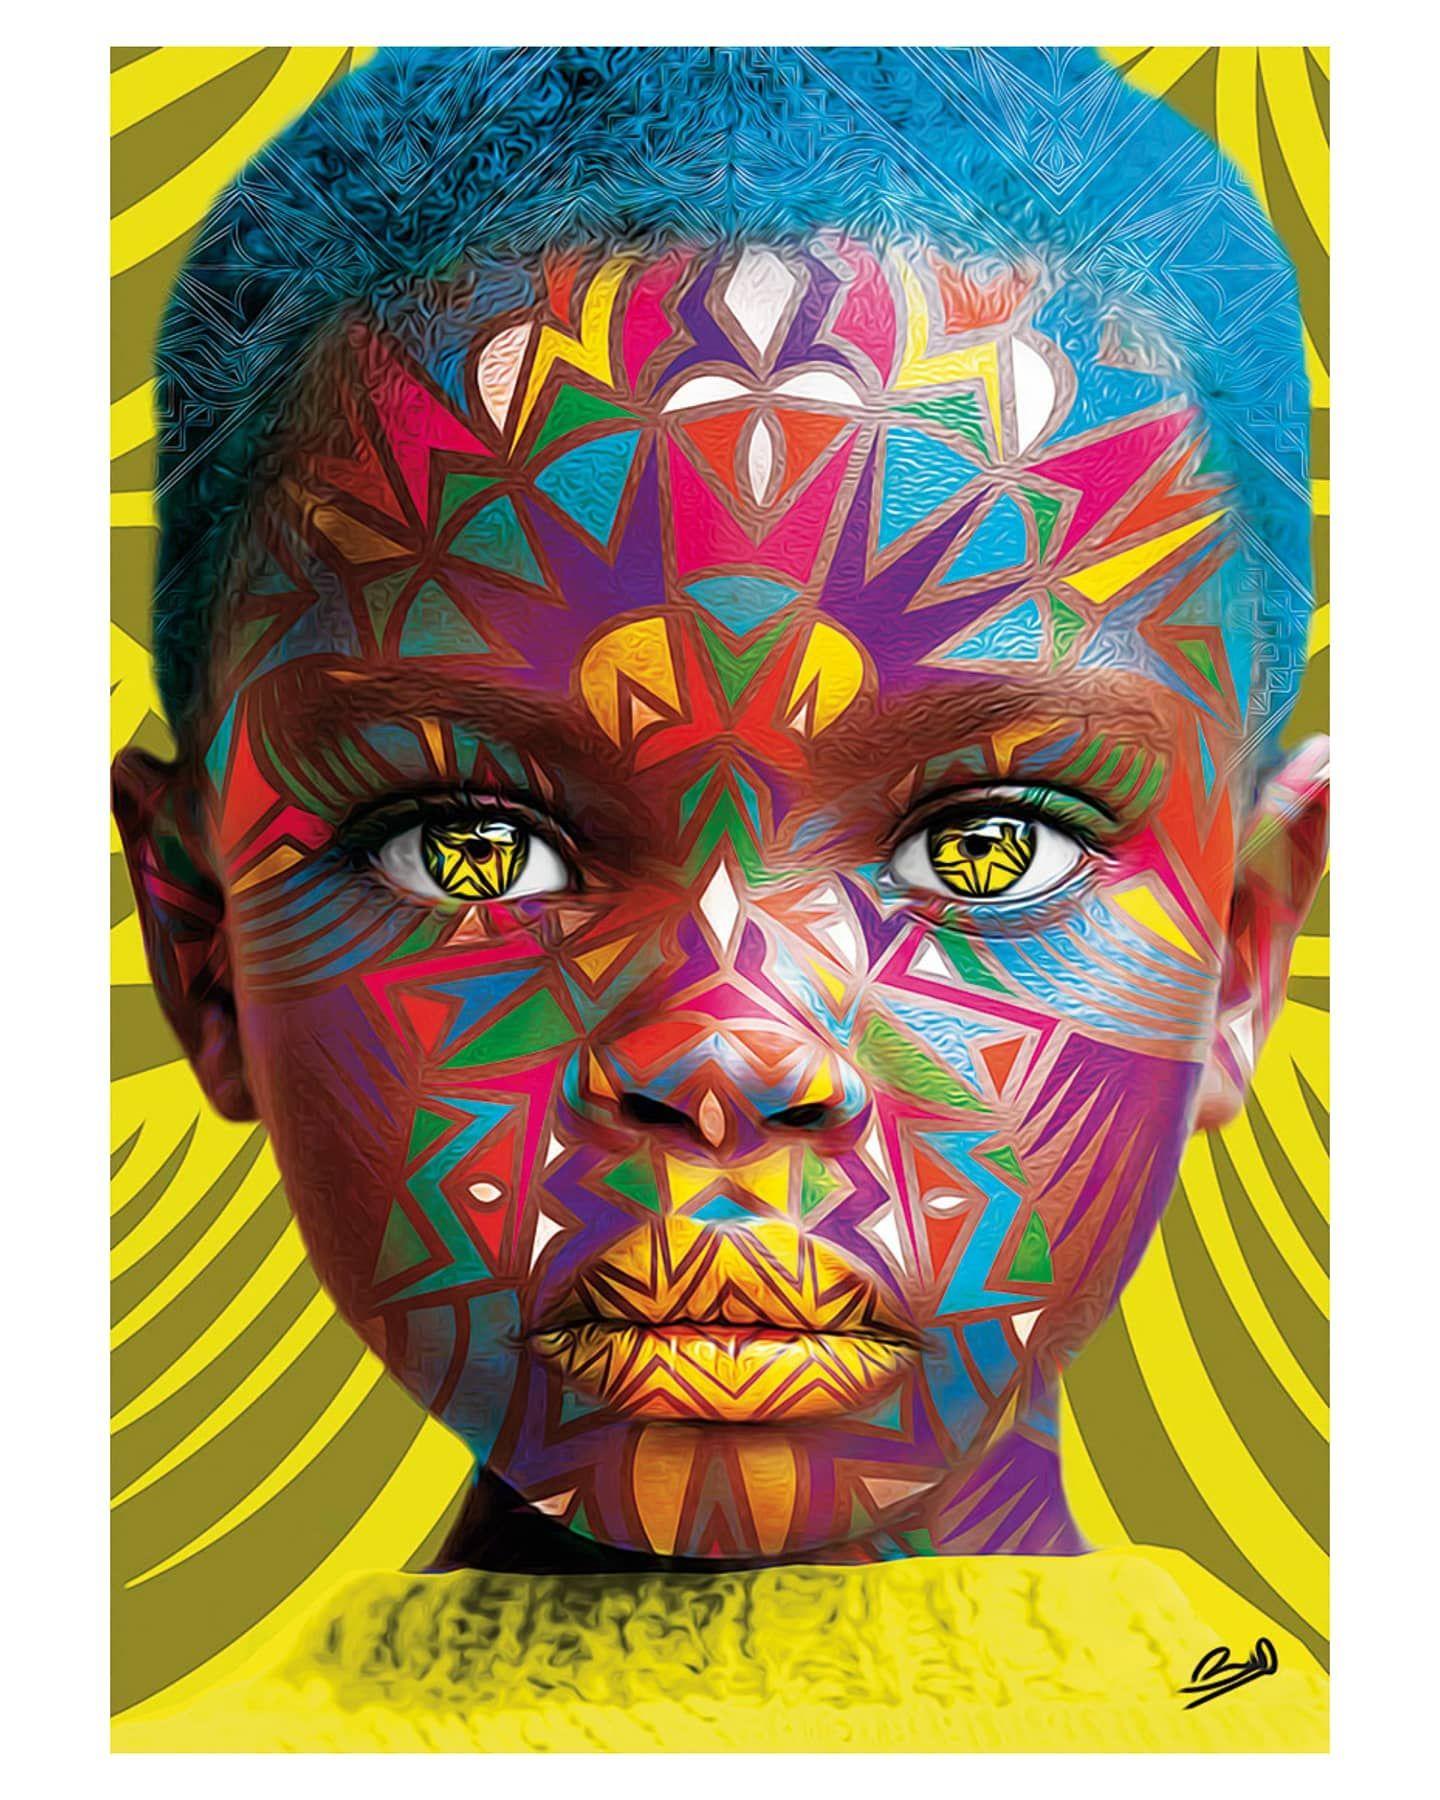 NAANGE ☀️ #Dopeblackart by @barosarre - Naange means sun in Senegalese Language  See more work at @barosarre   #photography#blackart #artoftheday#artfeature #artdaily #igart#digitaldrawing #realisticdrawing #pencildrawing #artspotlight #igartist #drawing #coolart #dopeart #blackartwork #artgallery #supportblackart #blackartist #coolartwork #artfido#artlife #artwork #dopeblackartist  For art subs or any business >>dopeblackart.com